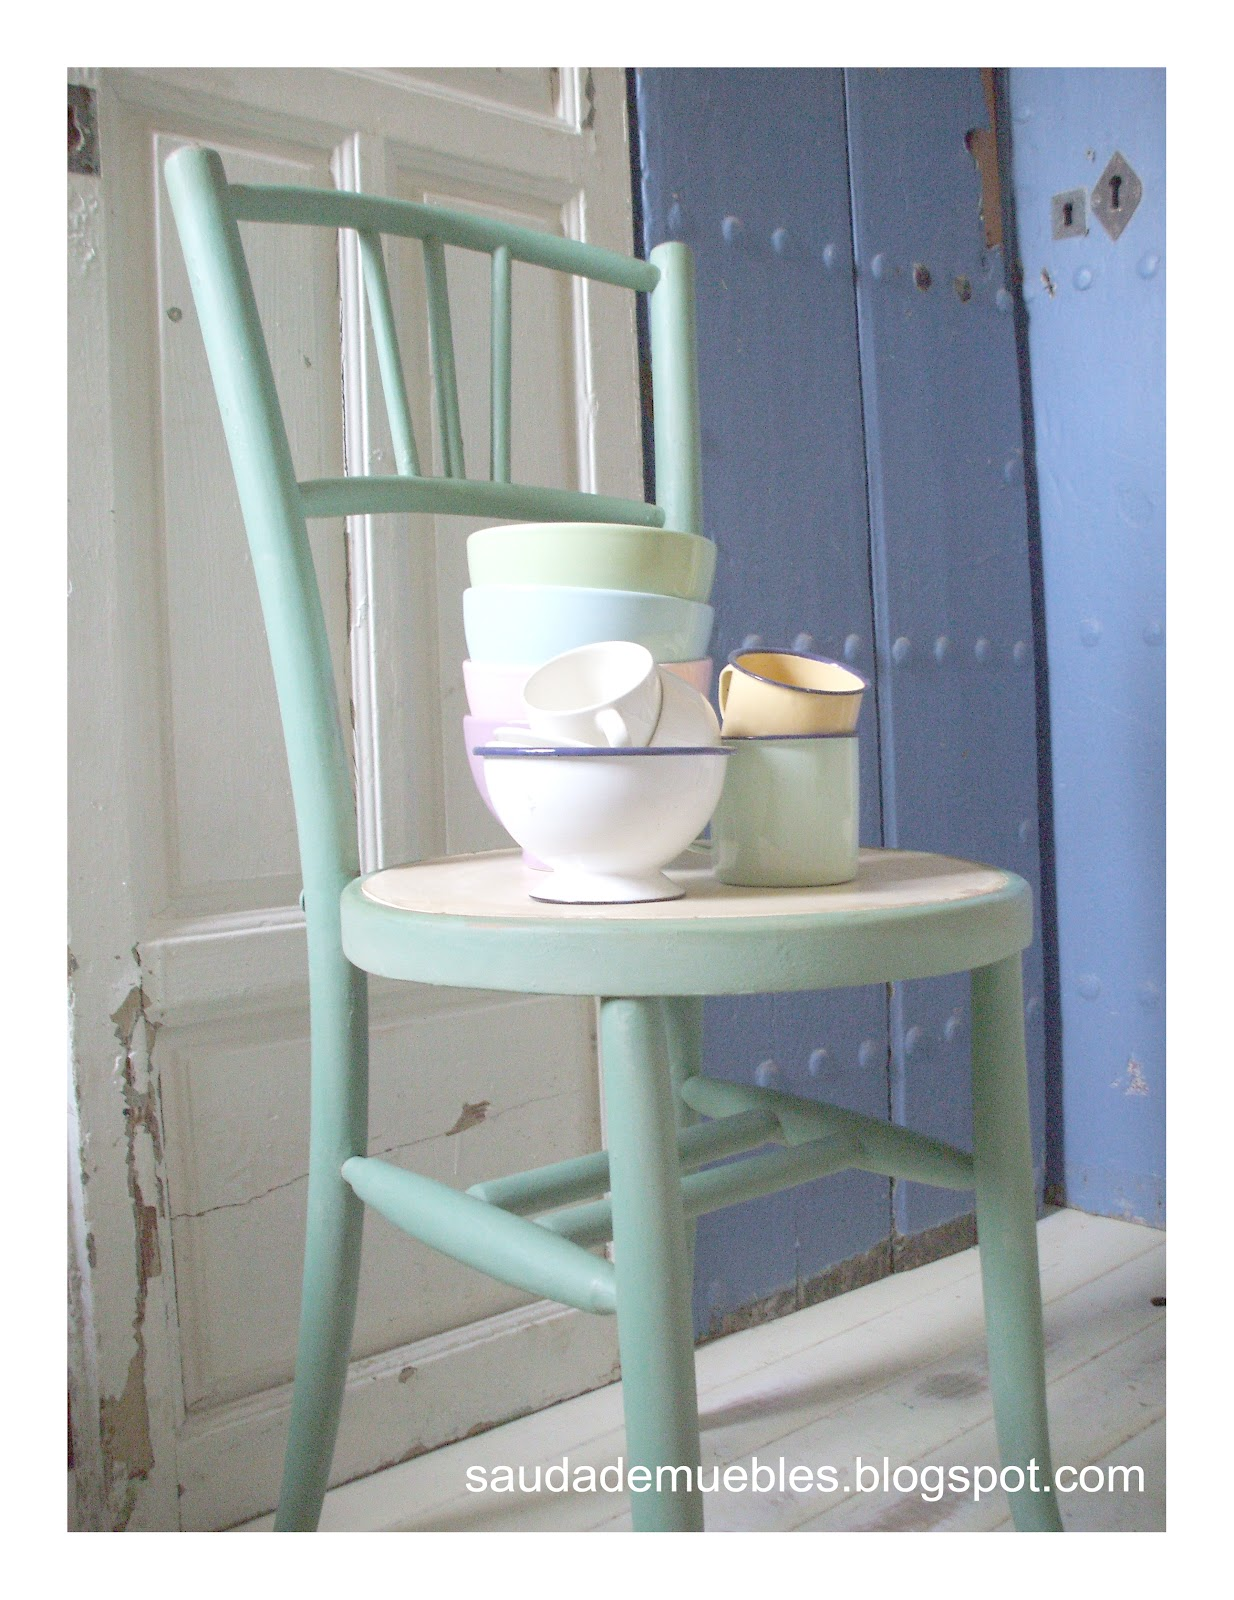 Saudade pareja de sillas - Pintar sillas de madera ...